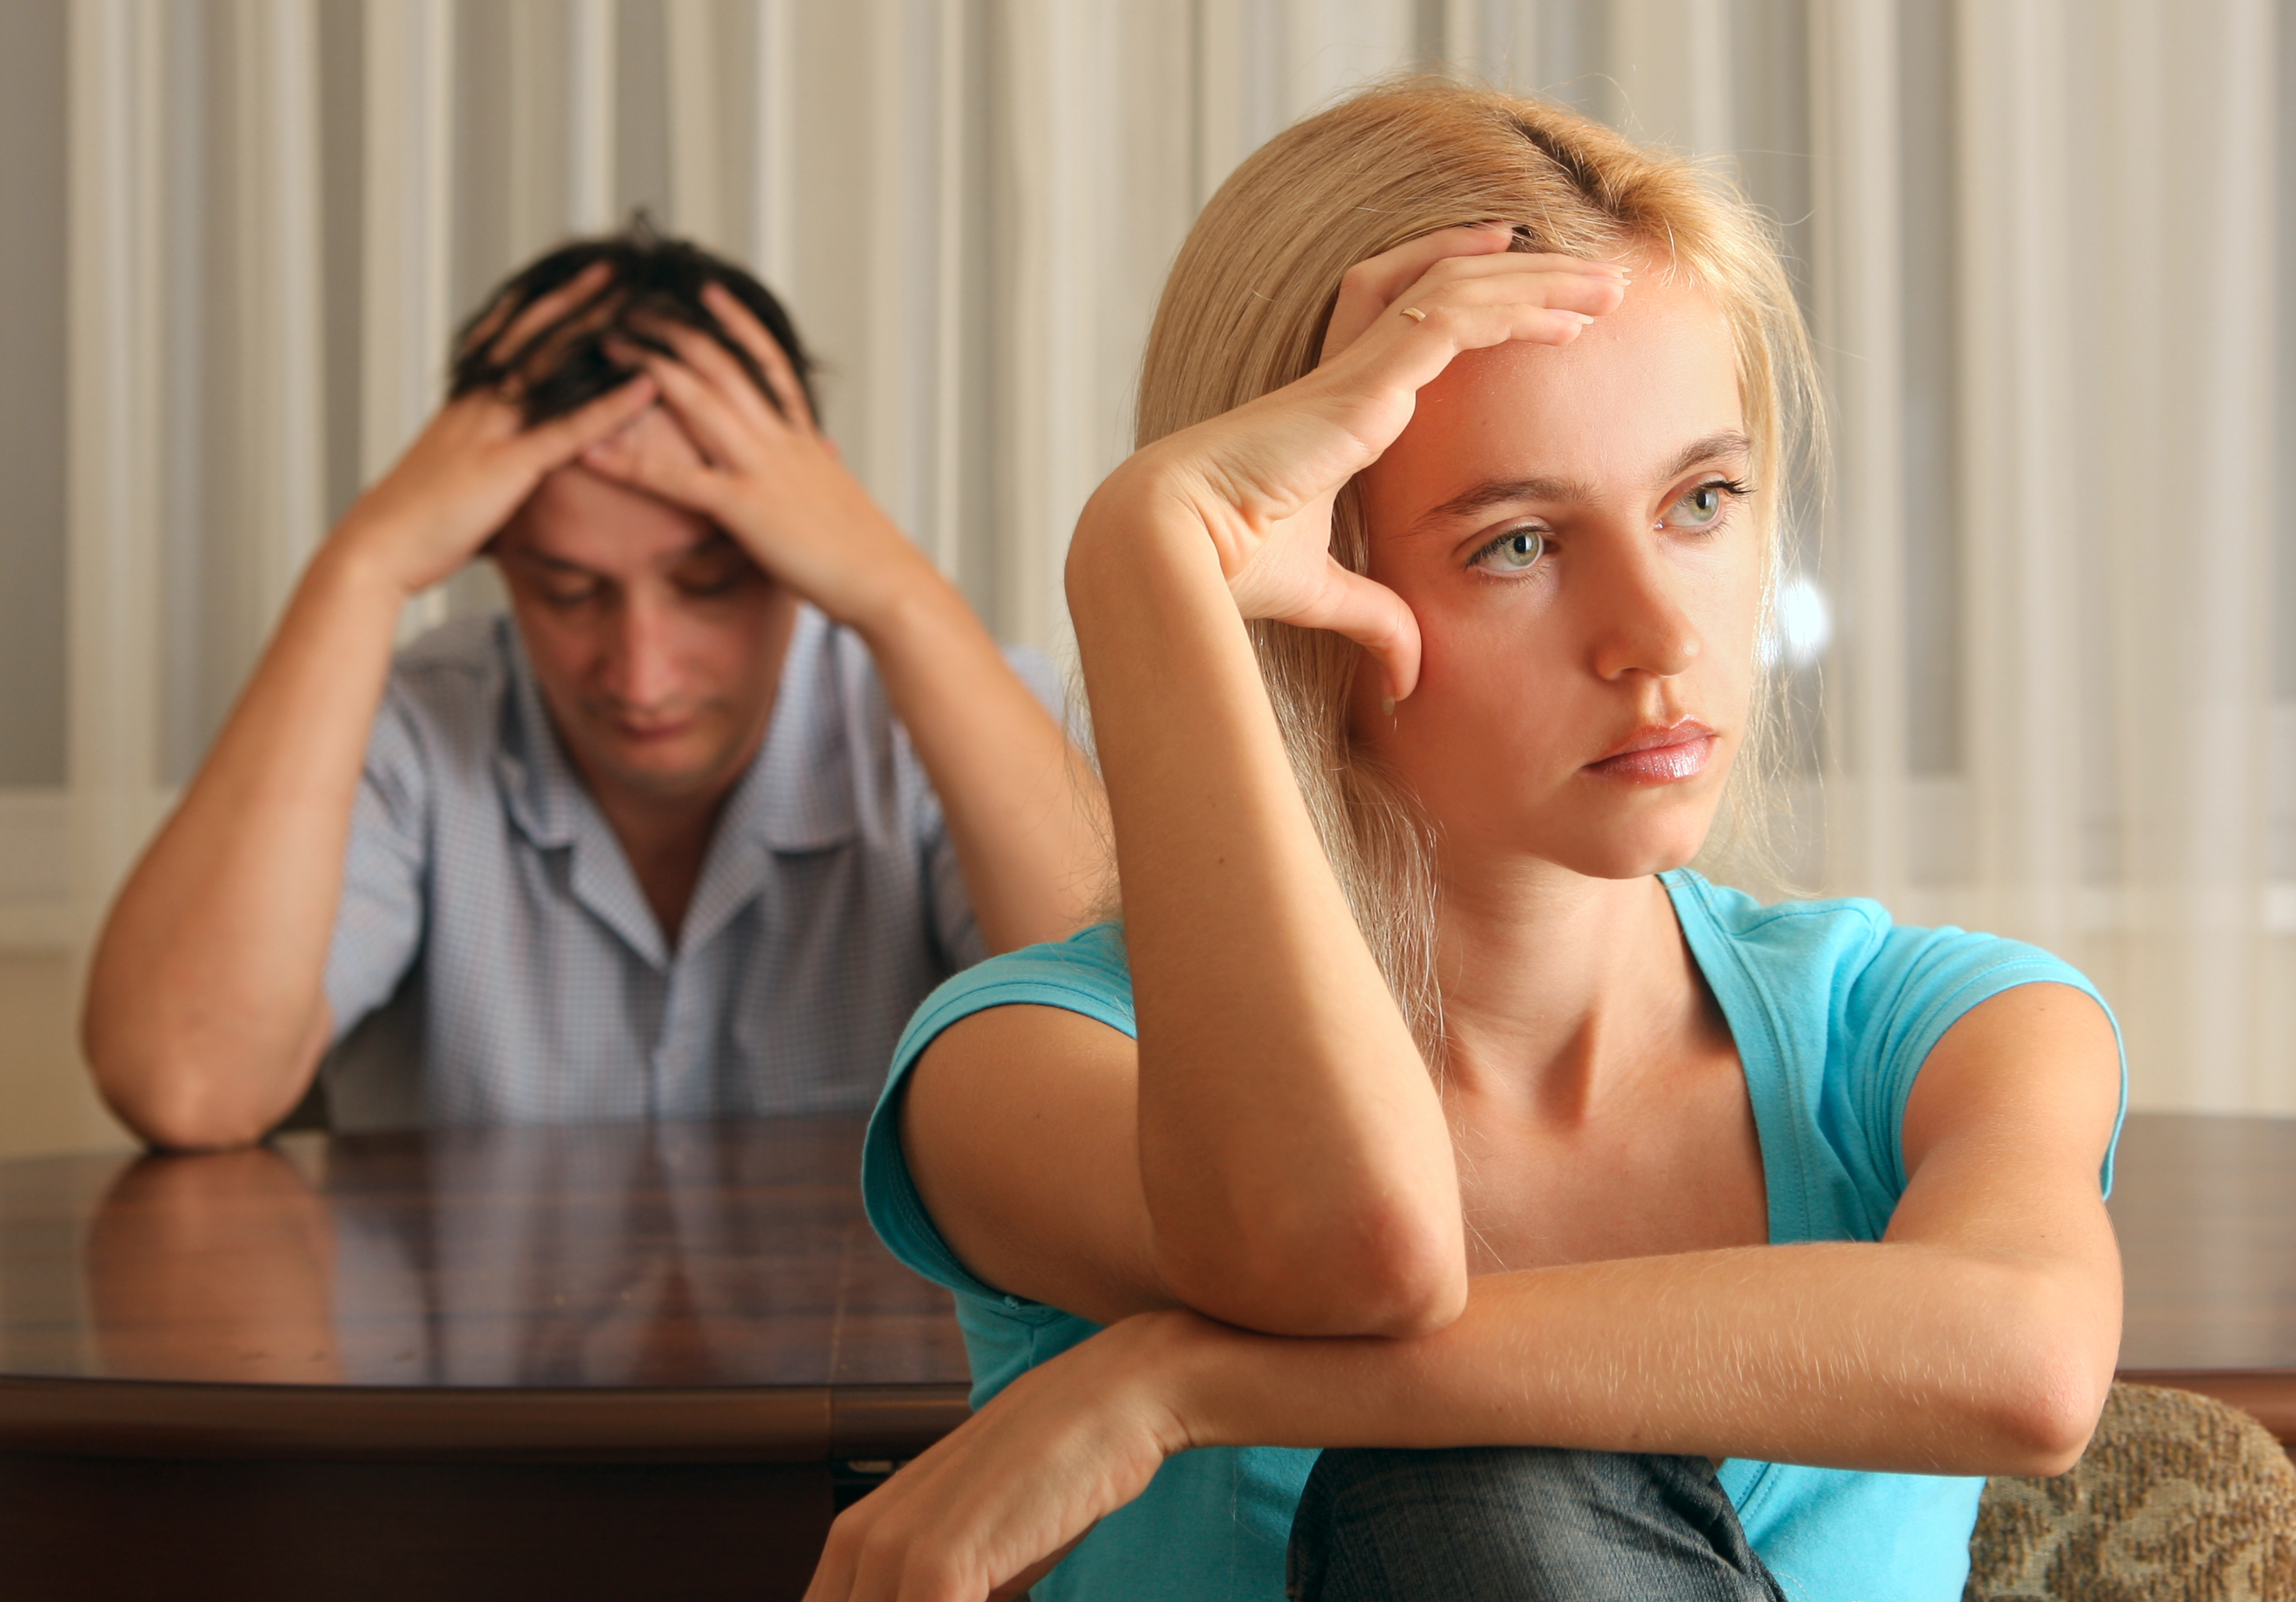 divorce help for children plano texas